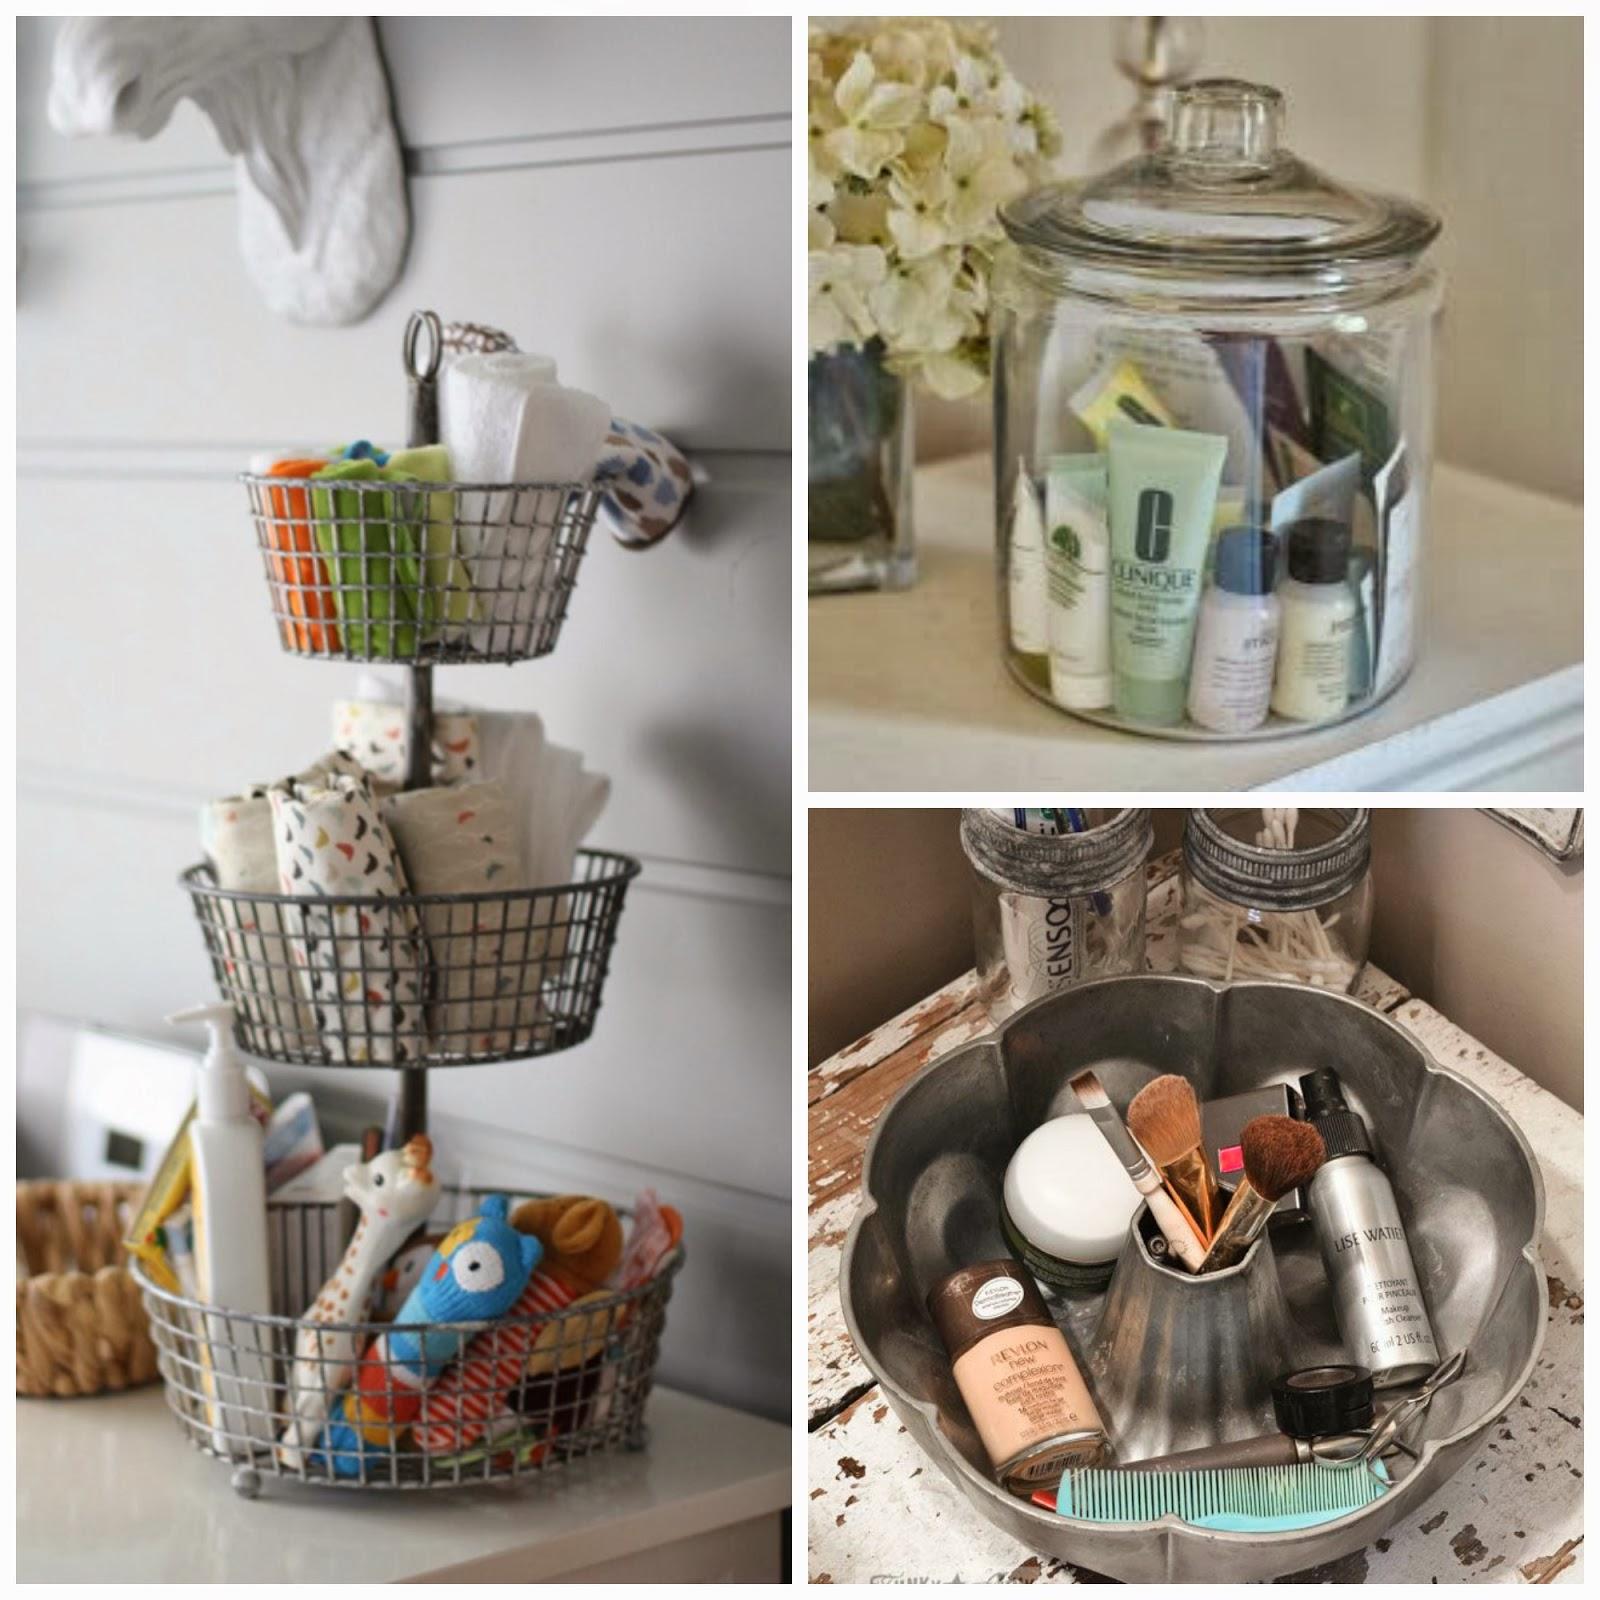 Organizing Bathroom Shelves: Craftivity Designs: 8-Week Organizing Challenge // Bathroom